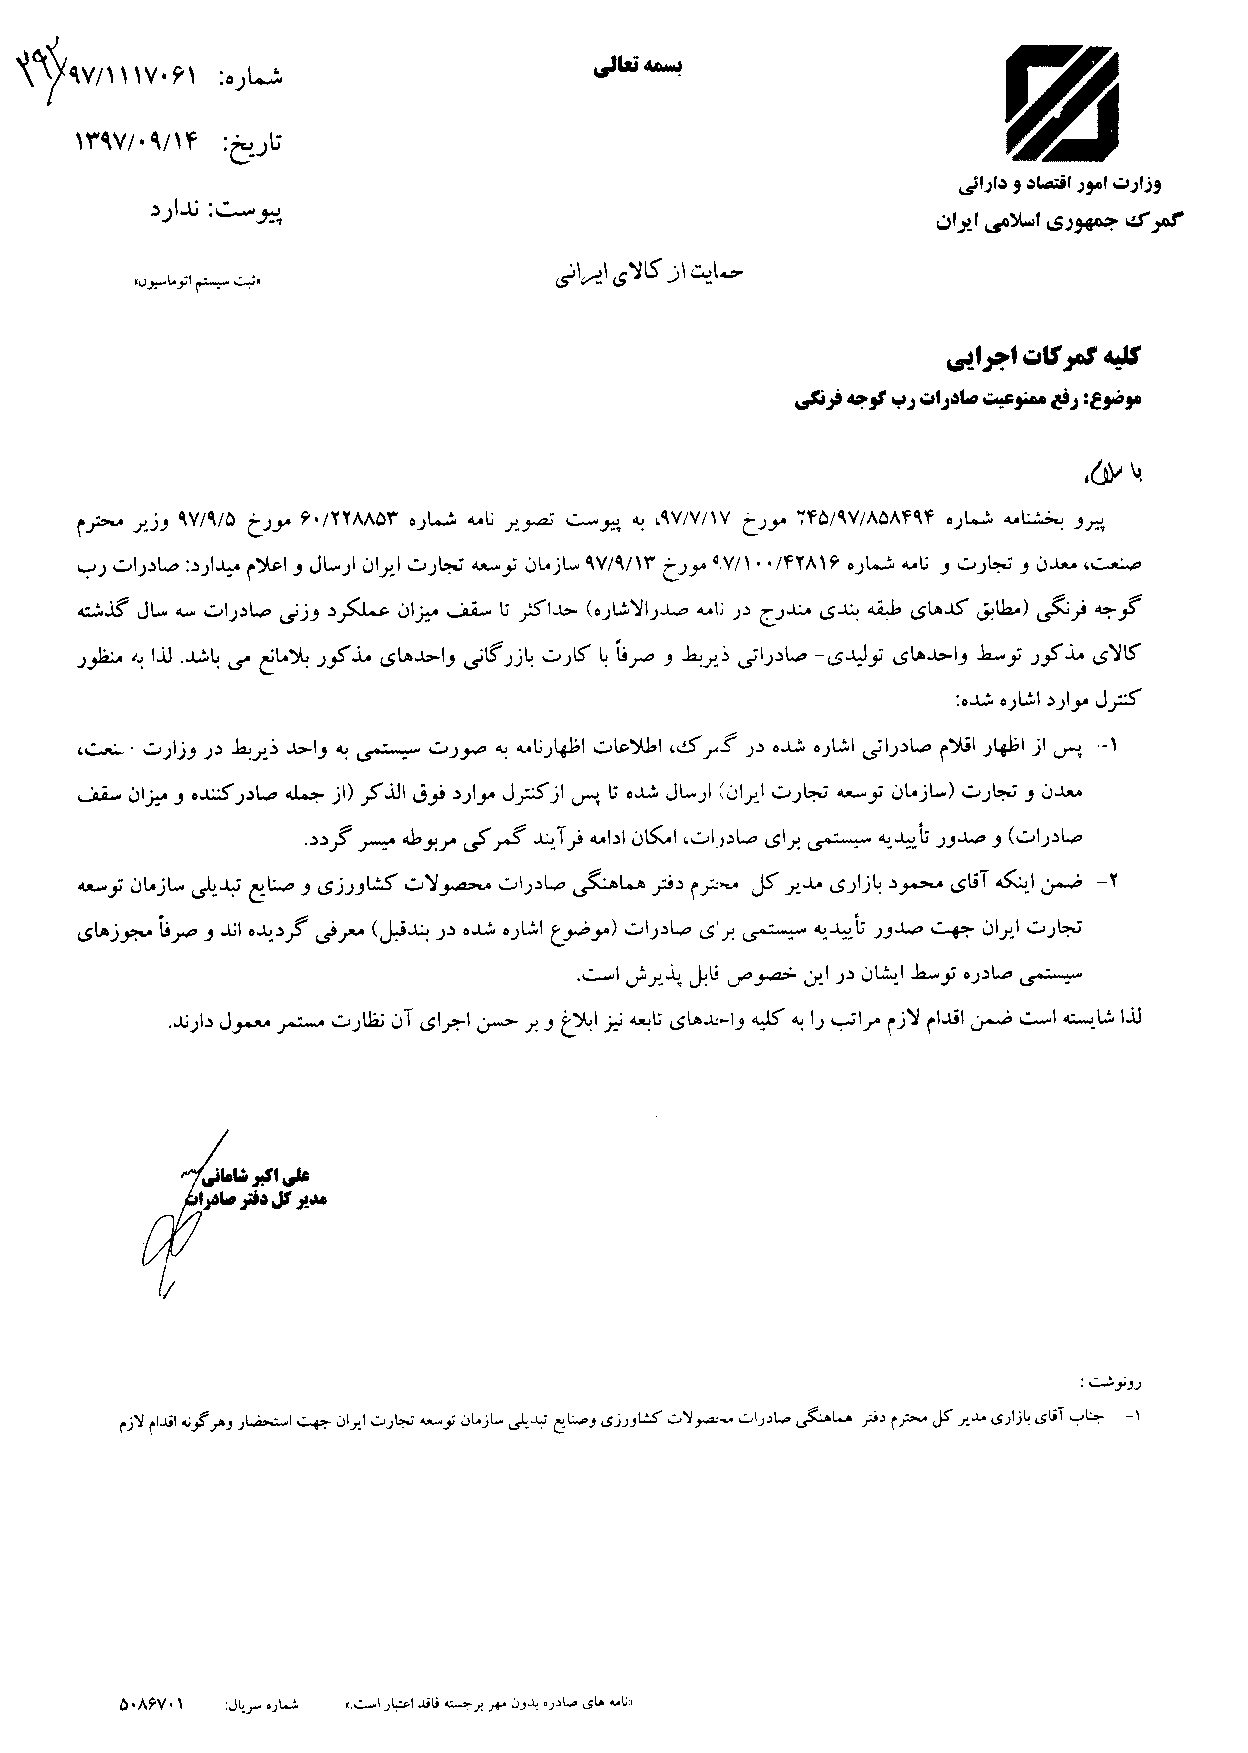 ممنوعیت صادرات رب گوجه فرنگی لغو شد